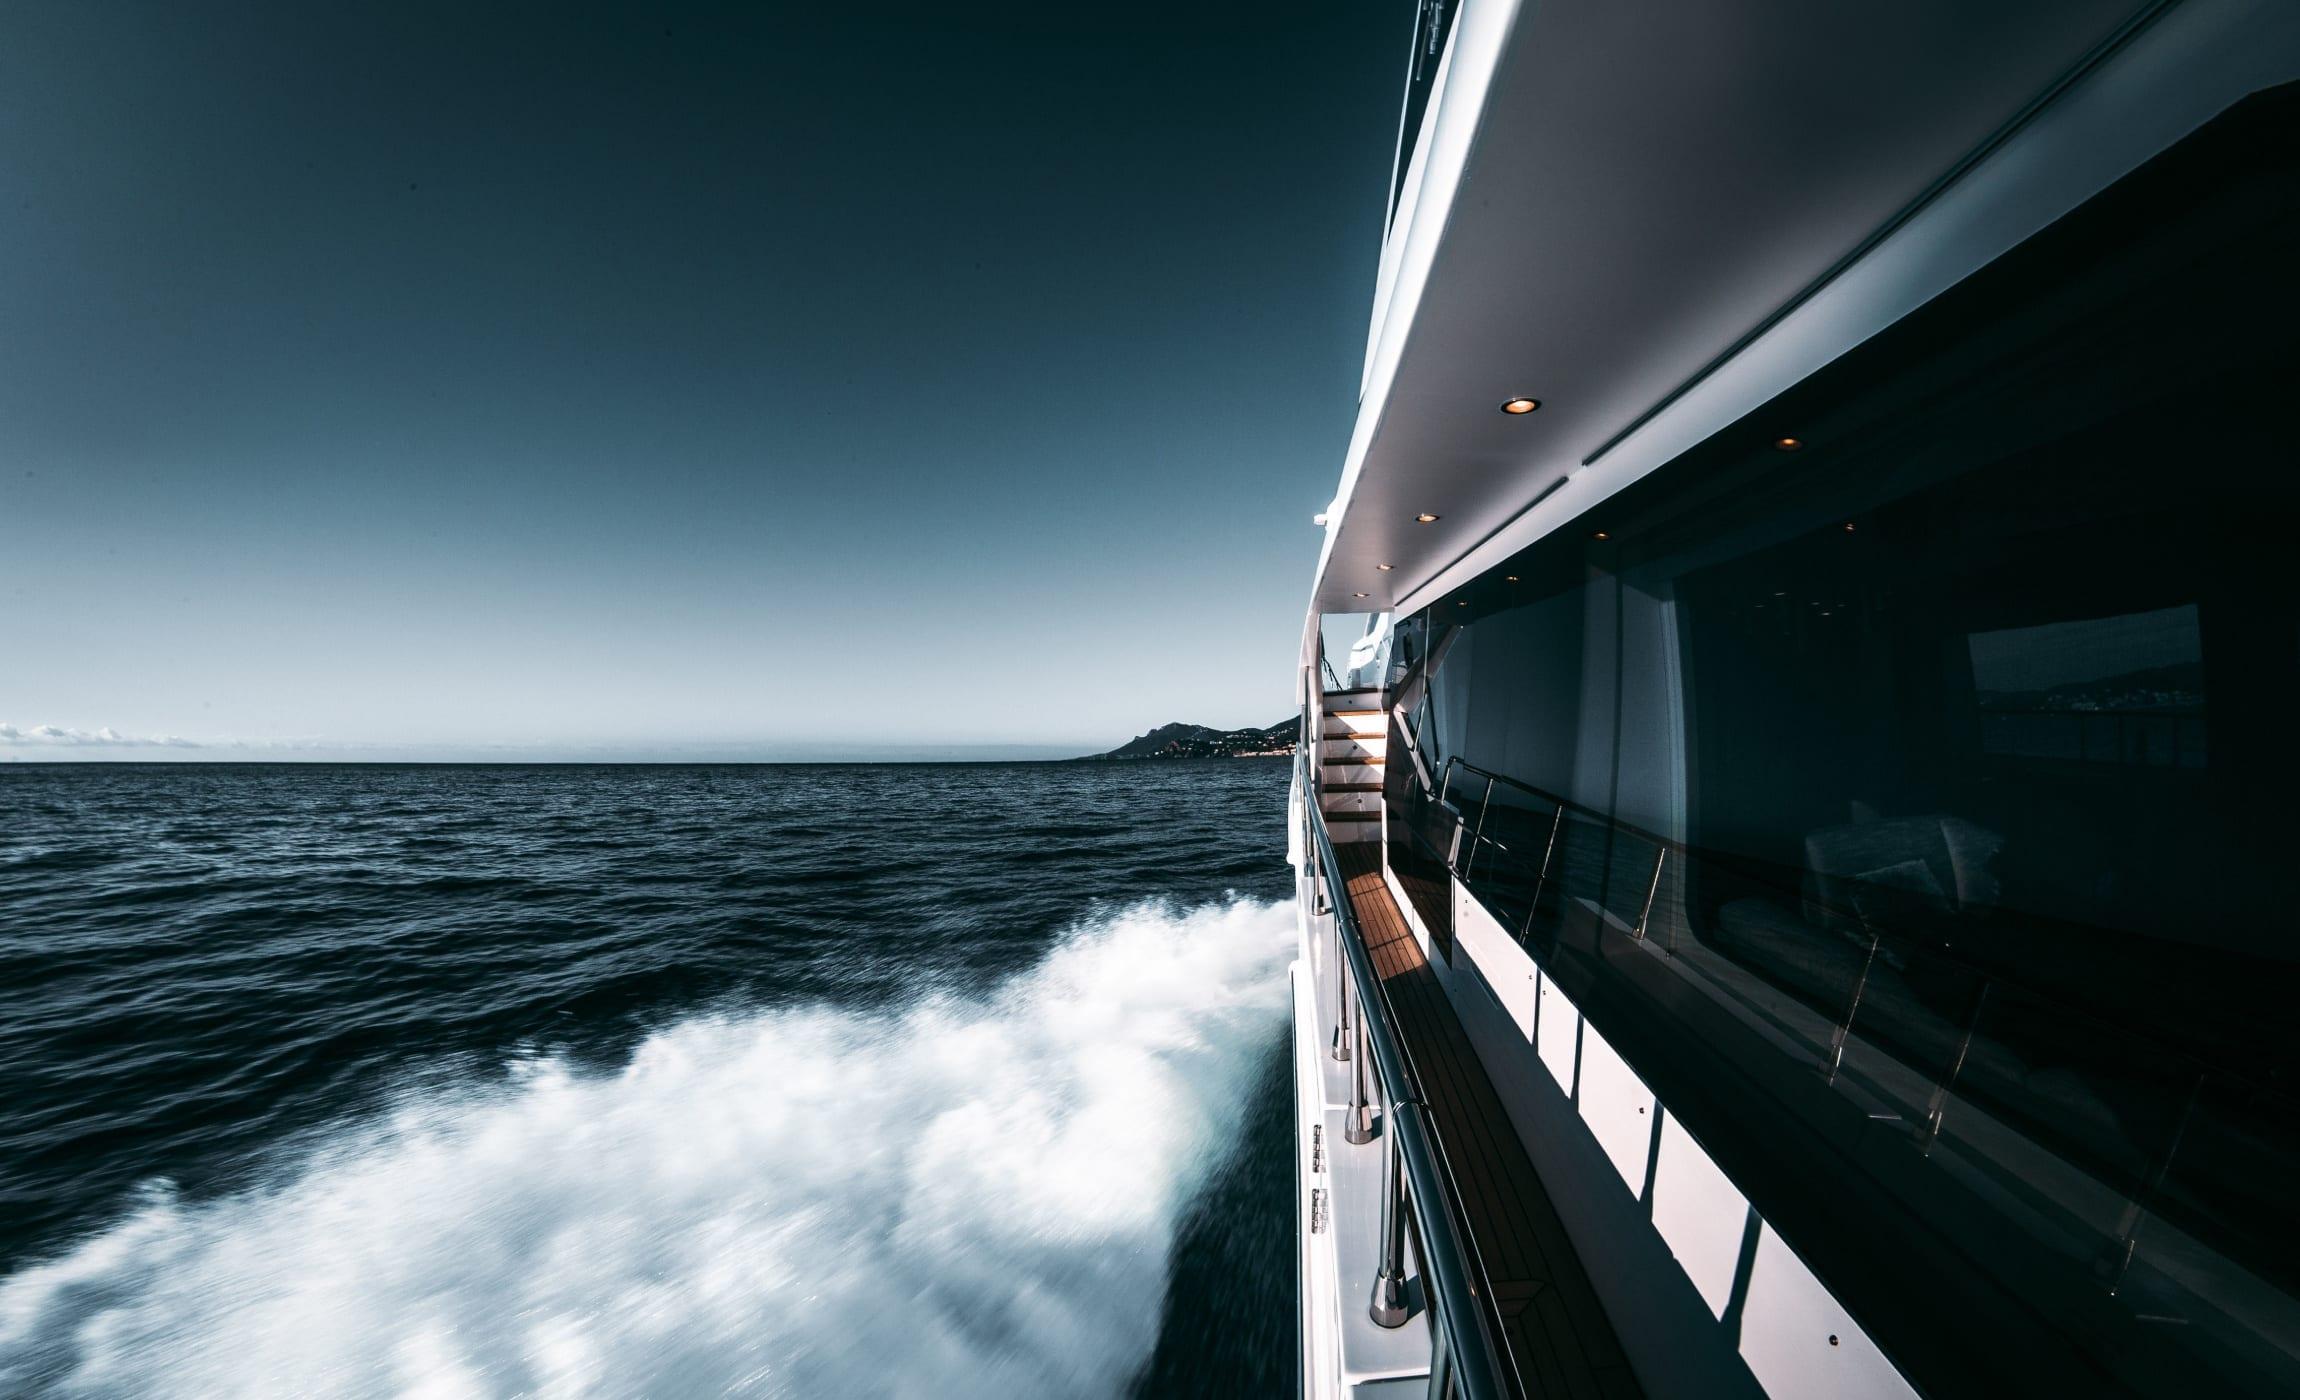 Luxury yacht running through open water